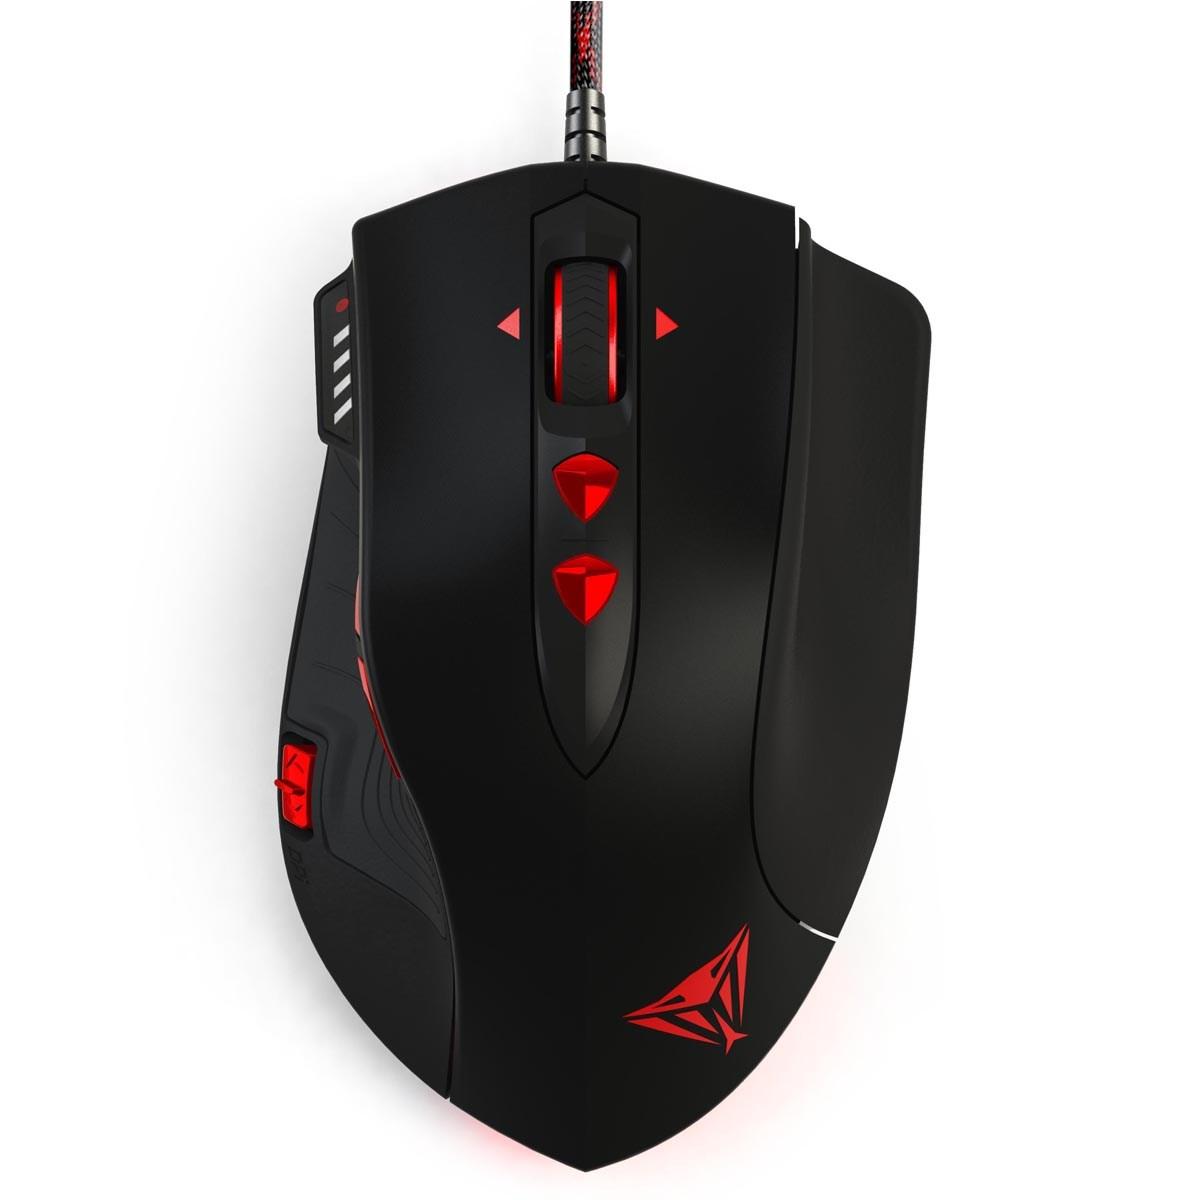 9532546ca7e Patriot Viper V560 Laser Gaming Mouse (Black/Red) - PV560LULPWK ...